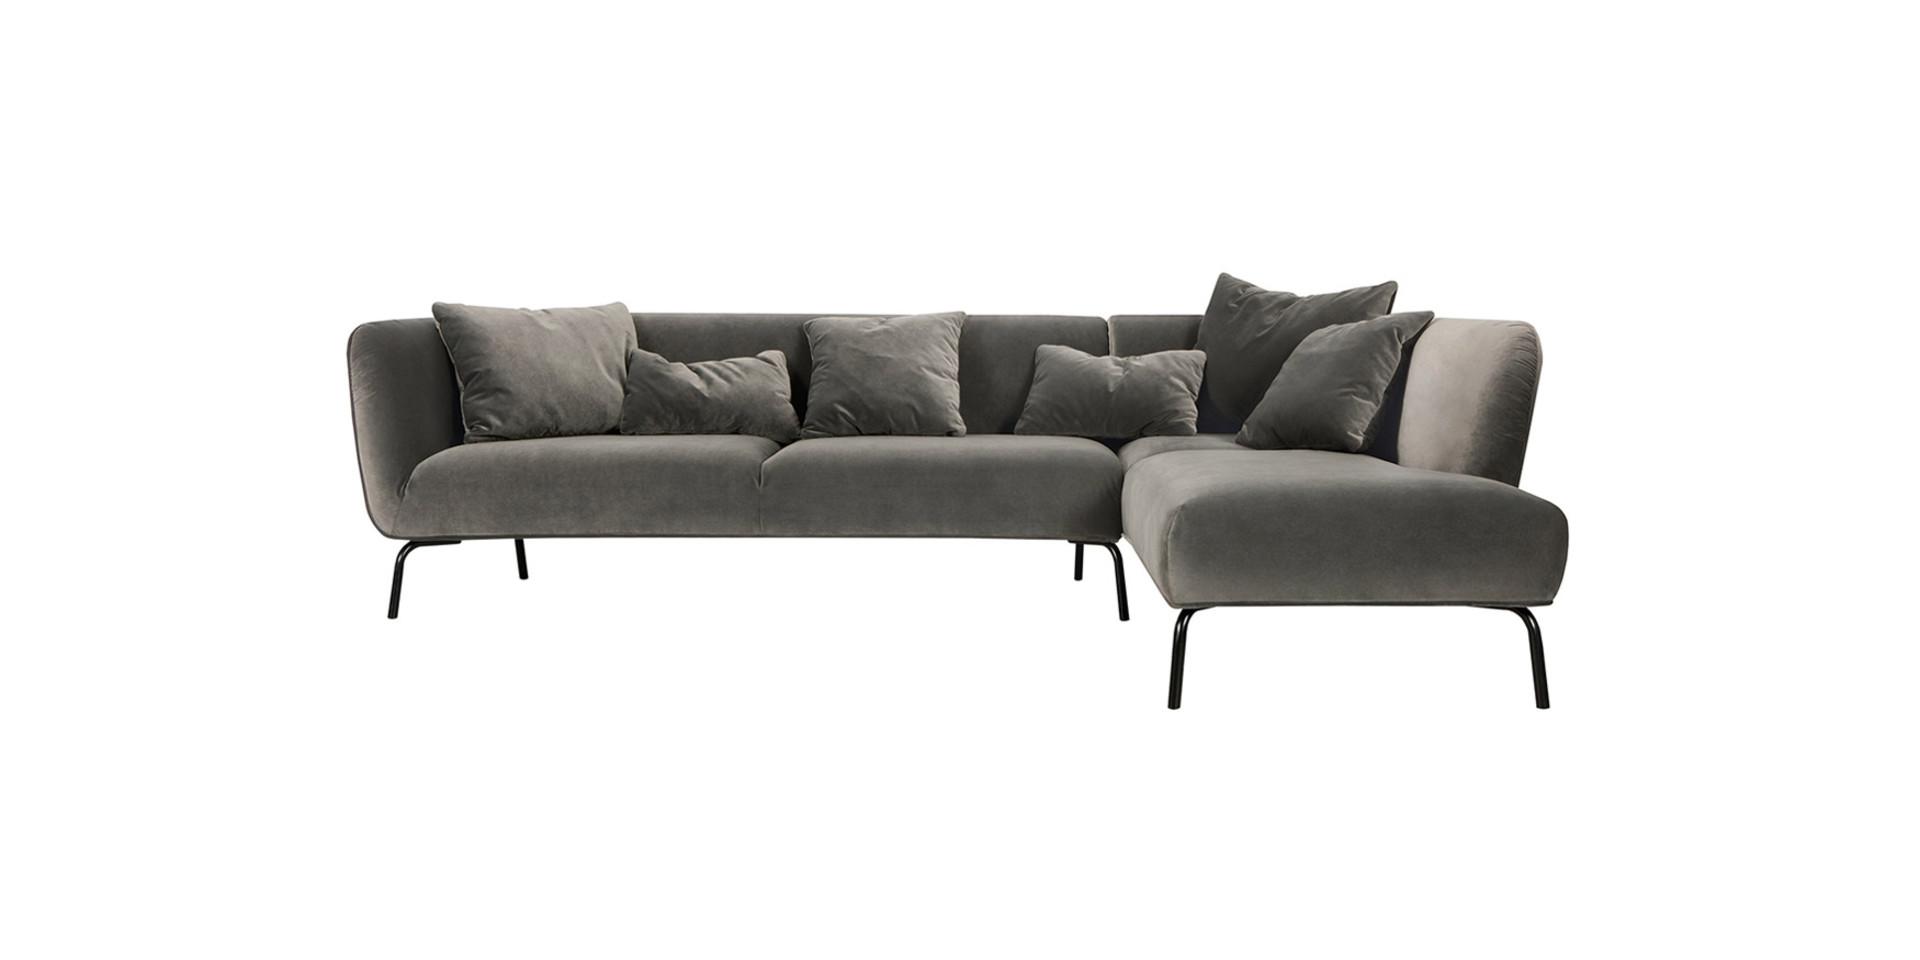 sits-selma-angle-set1_classic_velvet5_grey_1